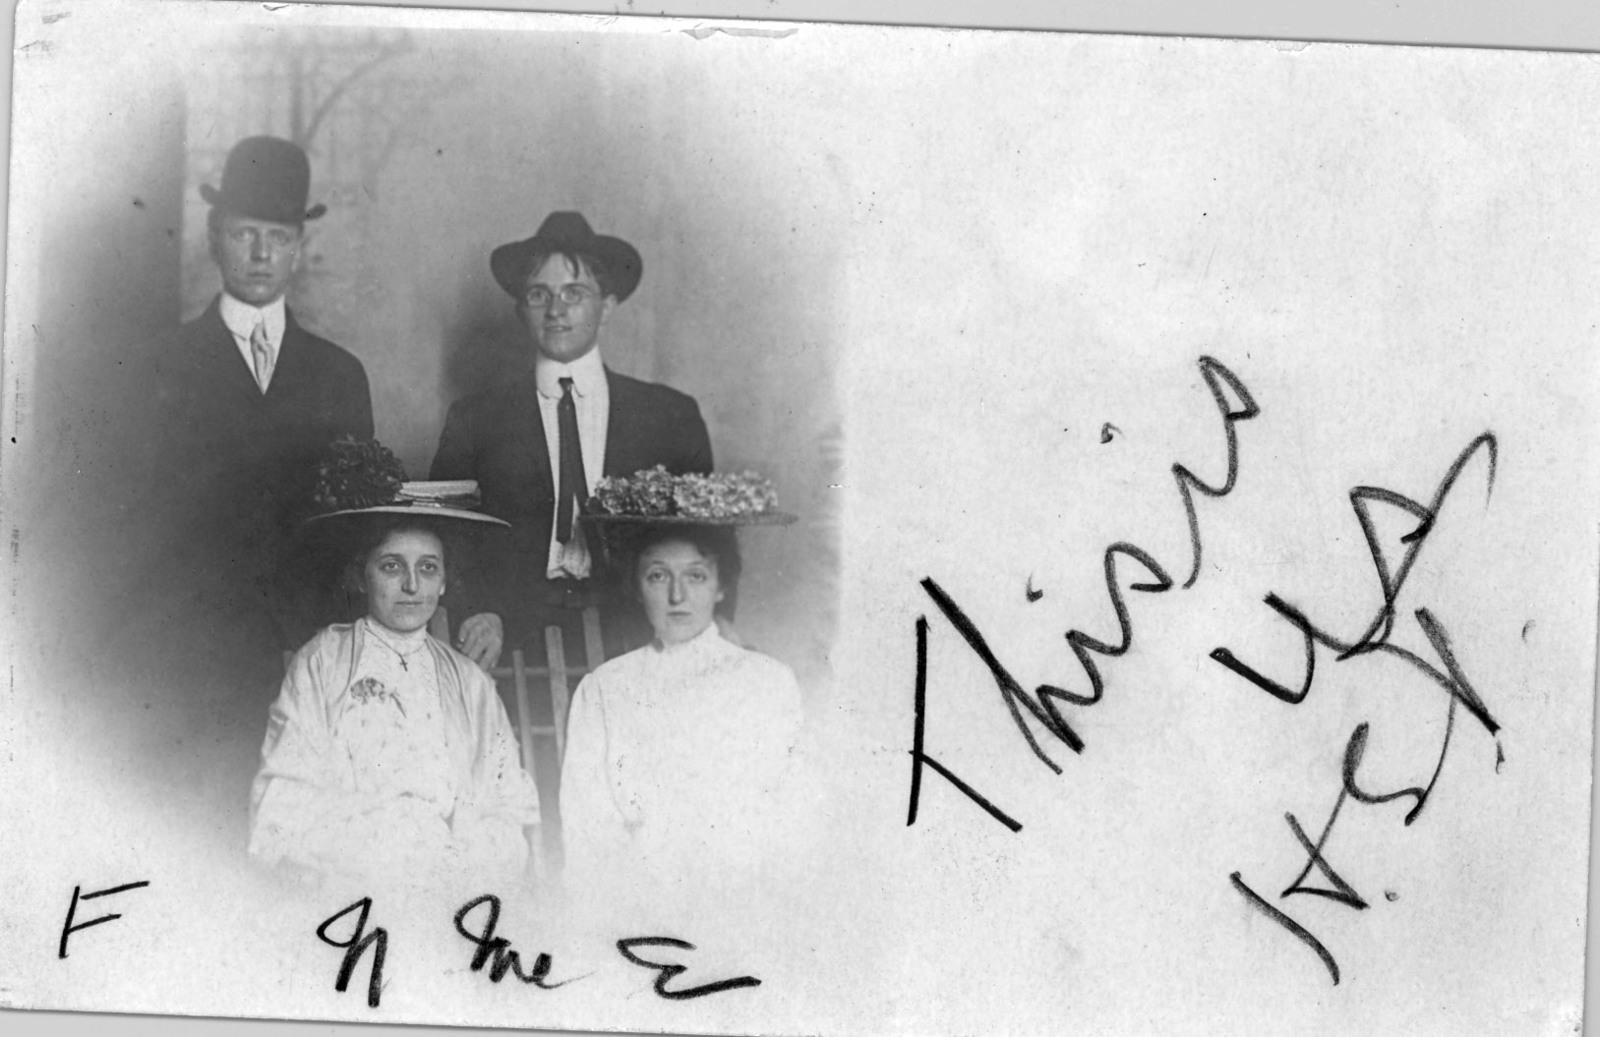 Harry S. Truman with his Noland Cousins